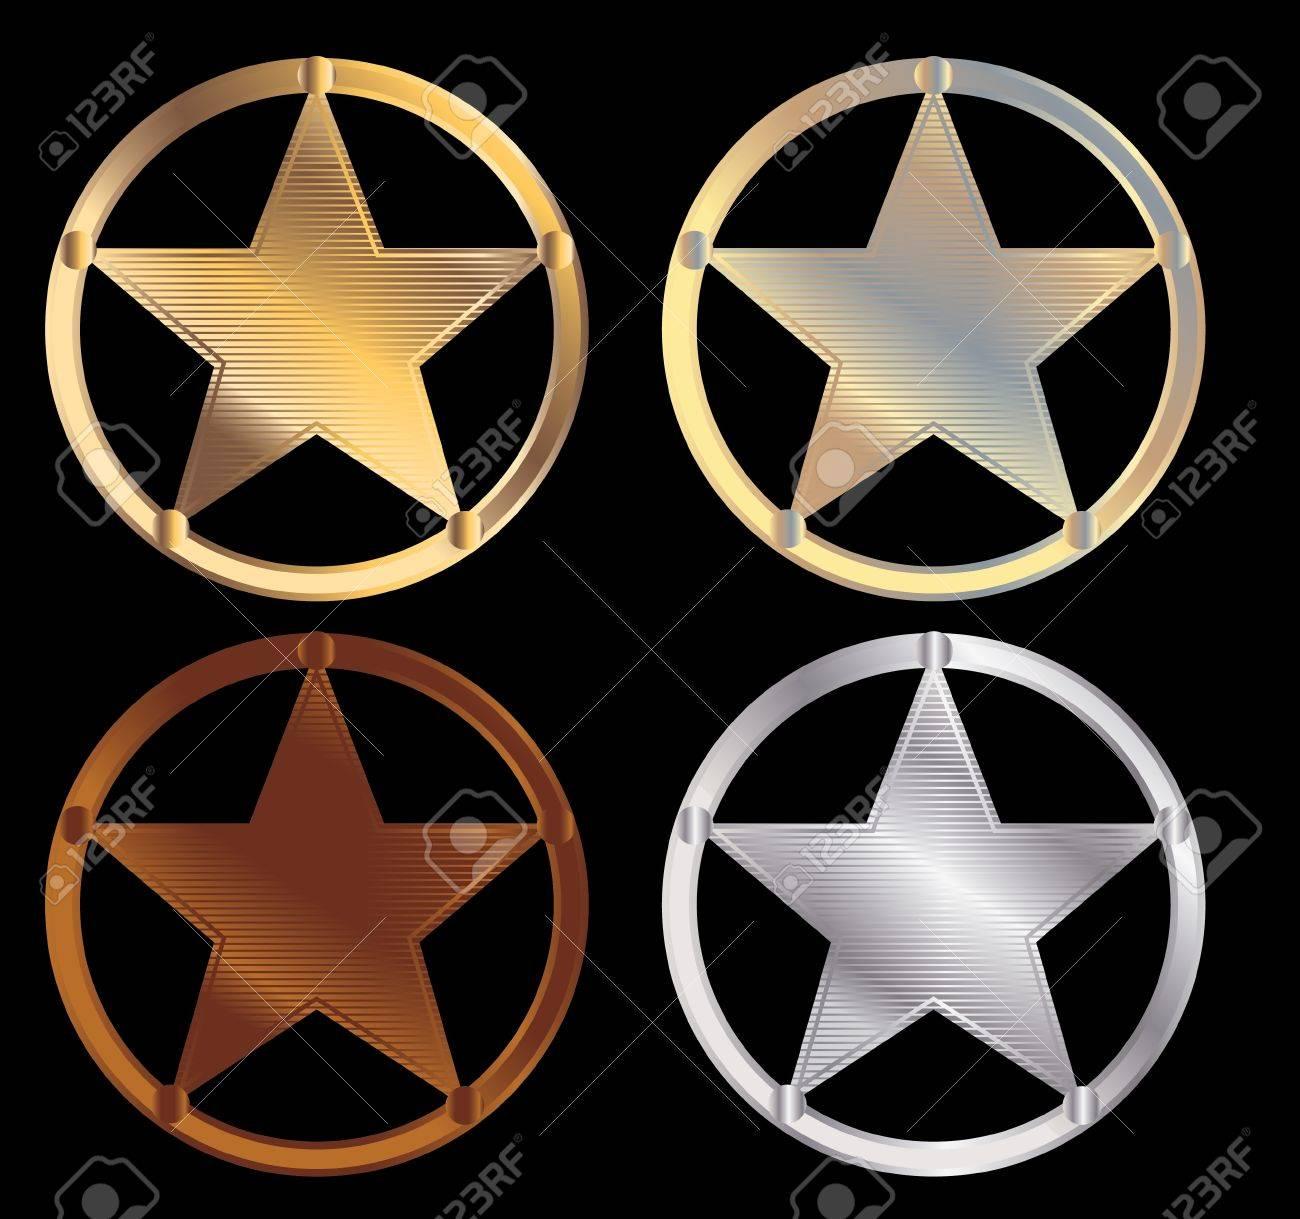 Shiny metallic sheriff stars on a black background Stock Vector - 7315160